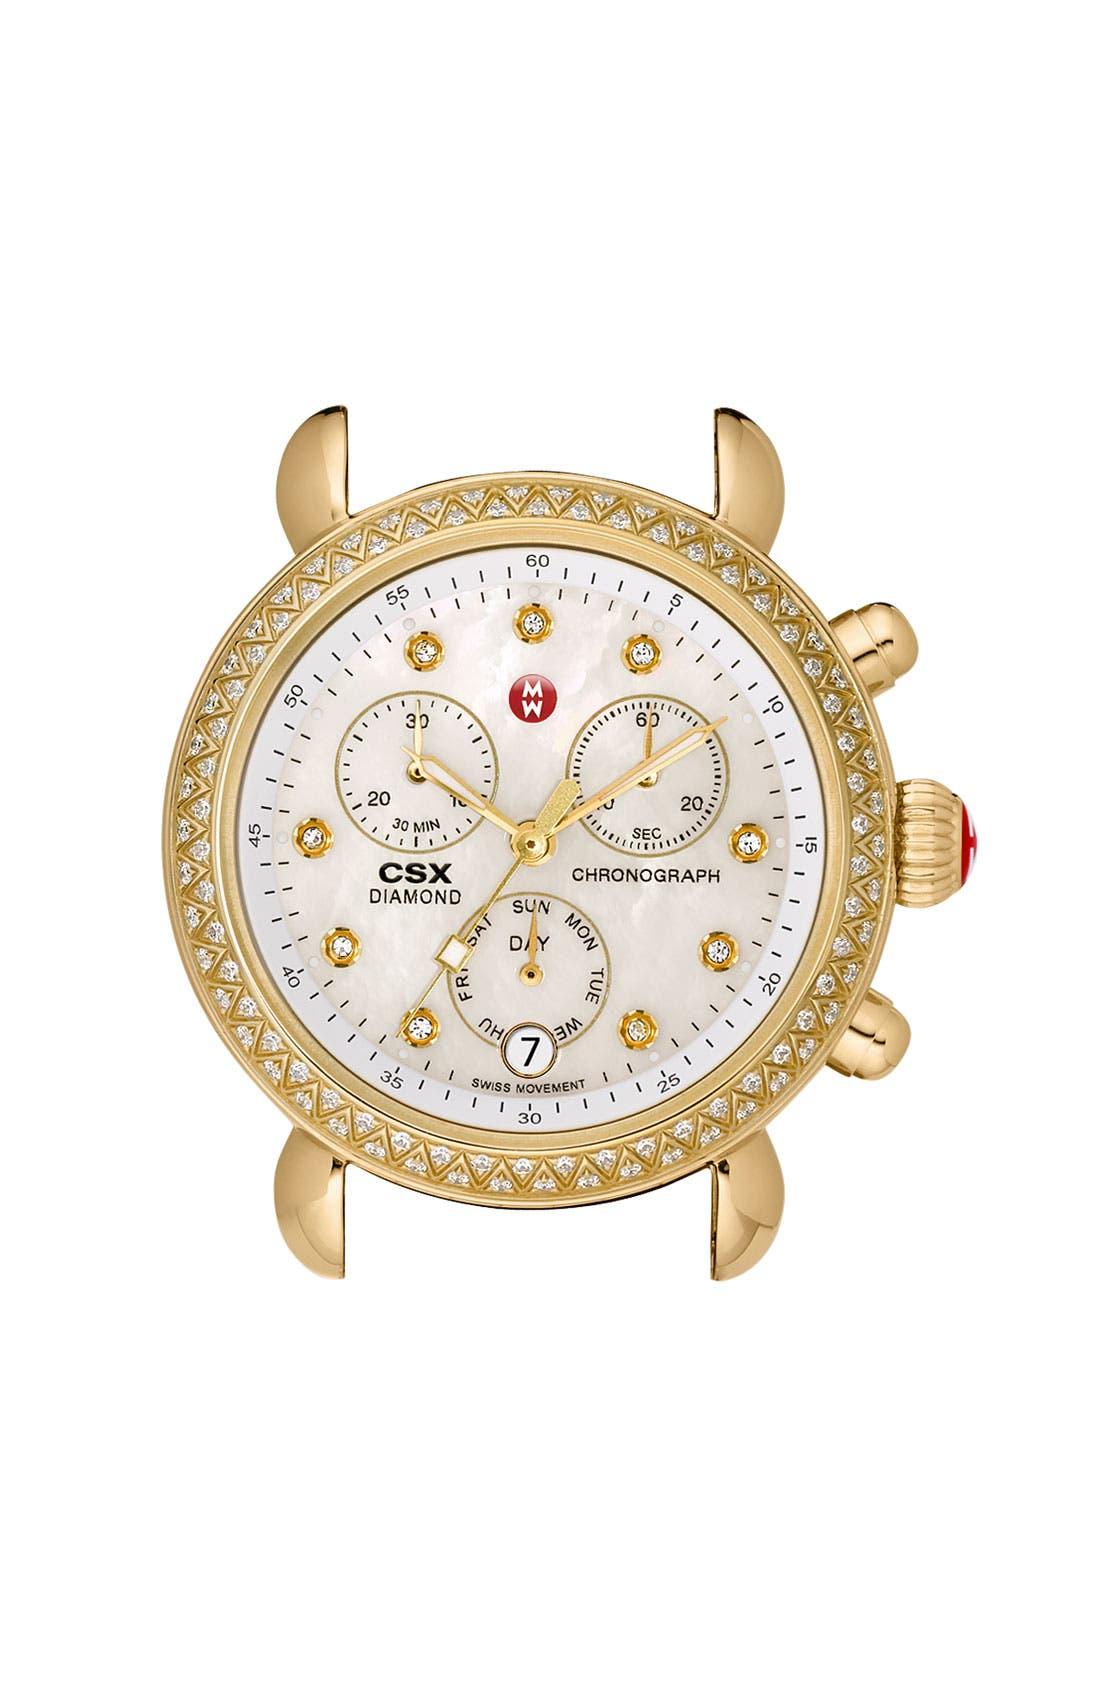 Main Image - MICHELE 'CSX-36 Diamond' Diamond Dial Gold Plated Watch Case, 36mm